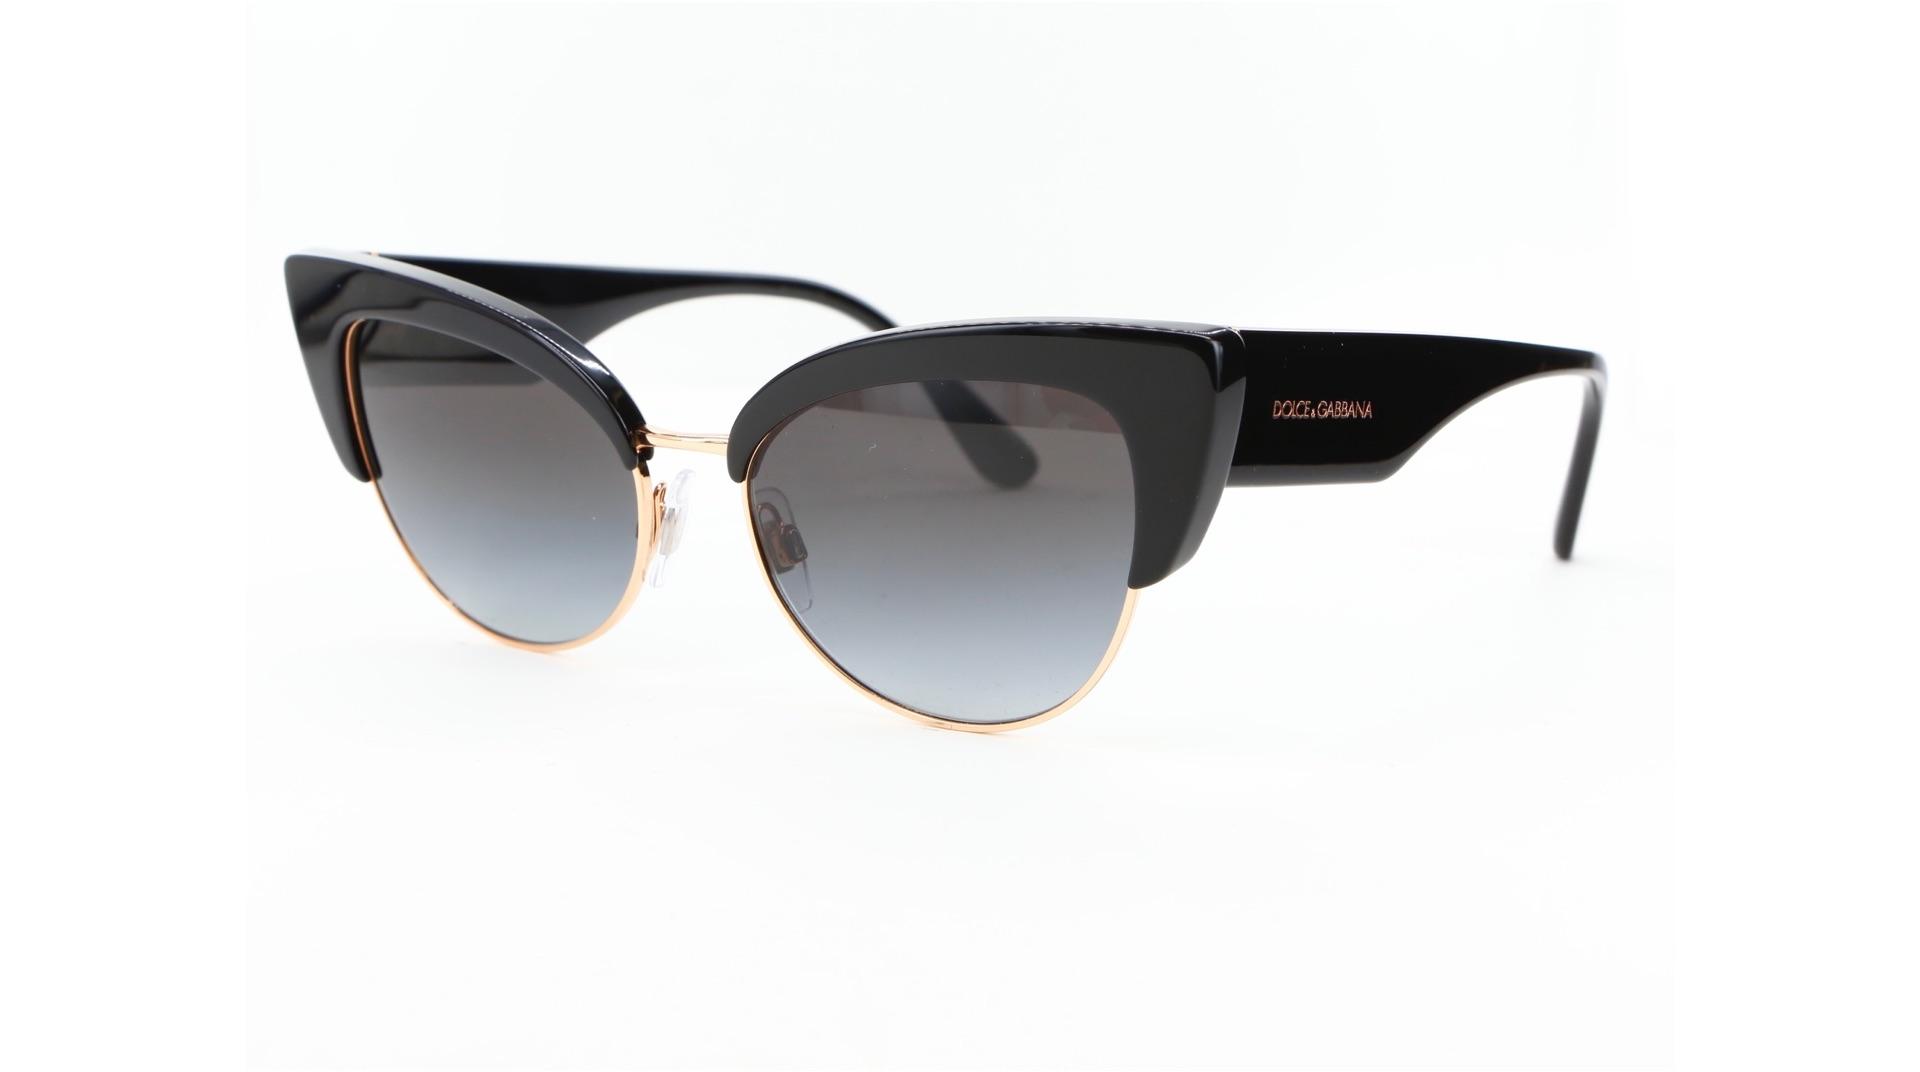 Dolce & Gabbana - ref: 81318